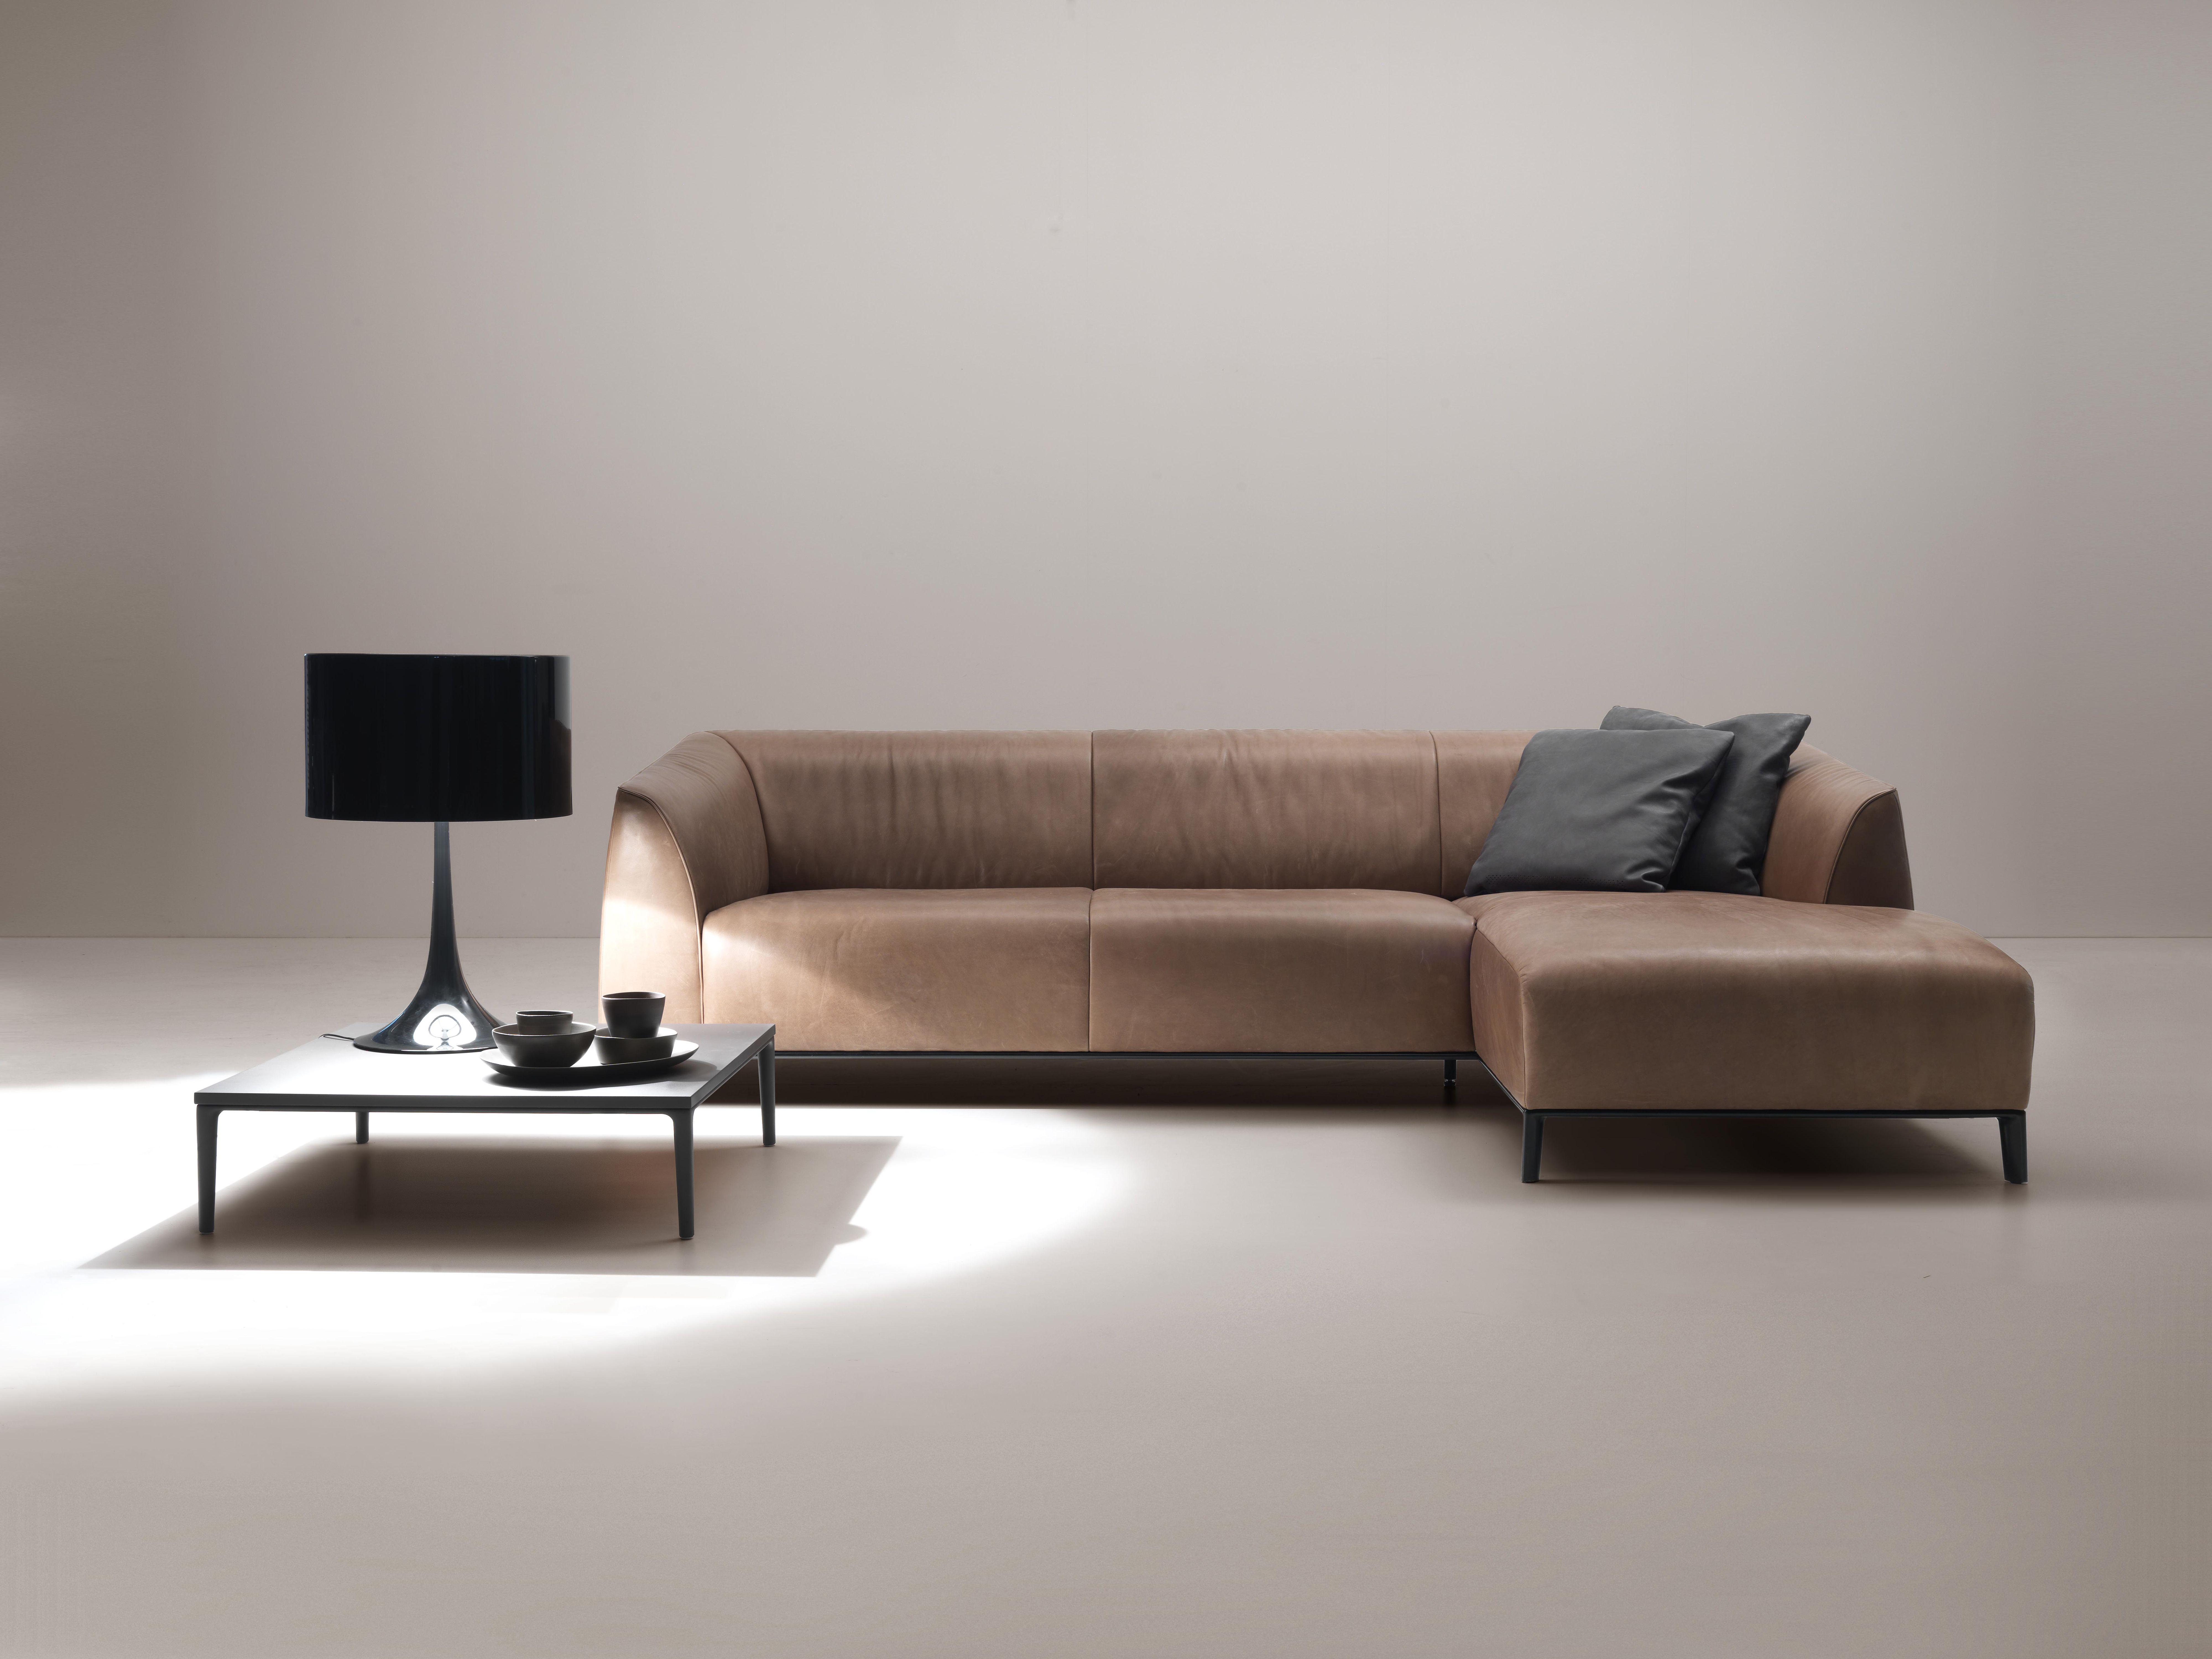 Canape En Cuir Haut De Gamme De Sede Fabrication Suisse Mobel Sofa Ecksofas Design